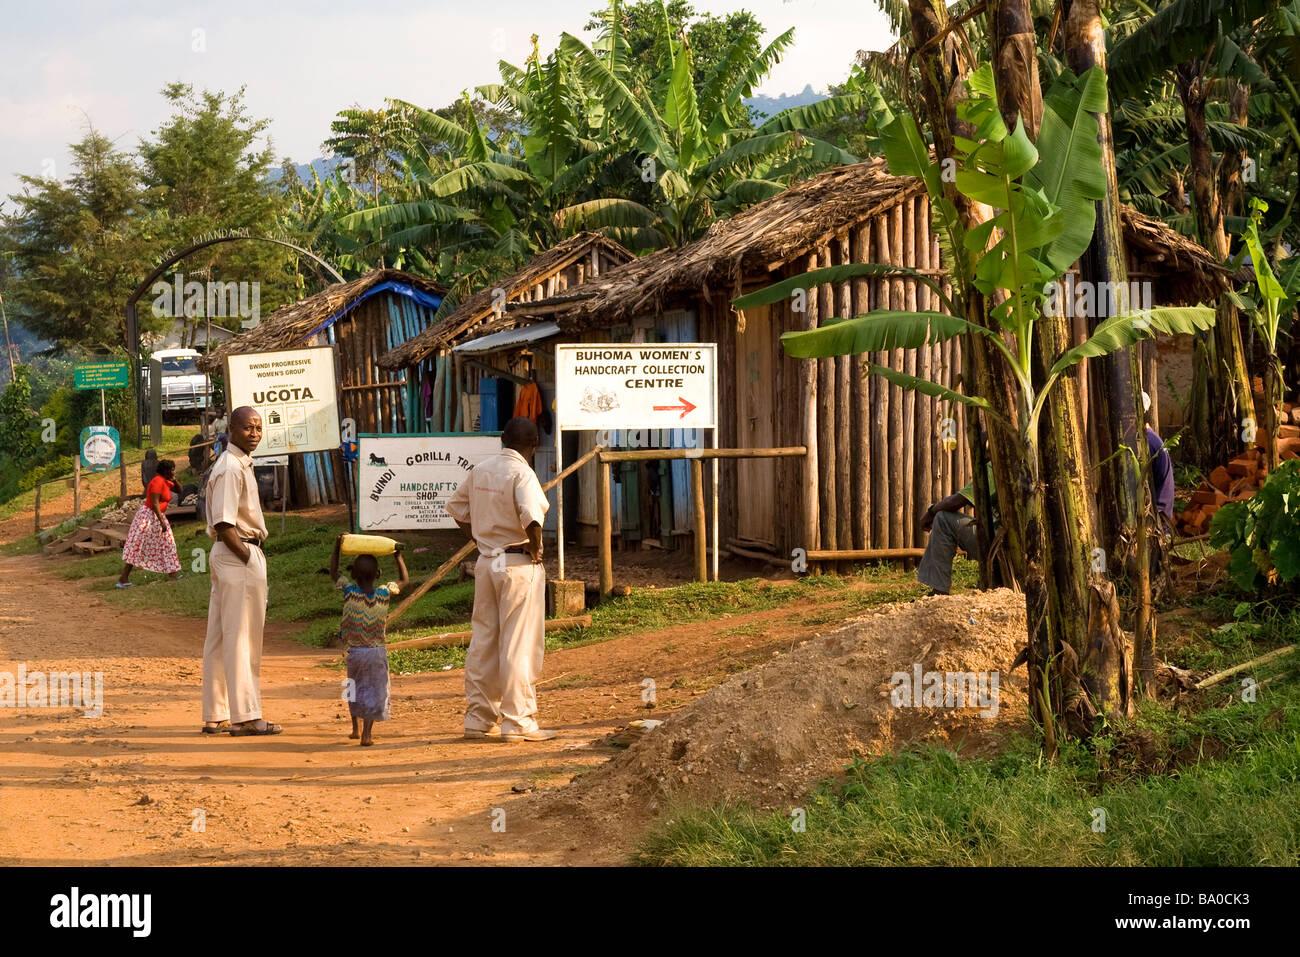 Street scene in Buhoma, Uganda. People in the street, wooden houses, banana trees. East Africa Stock Photo